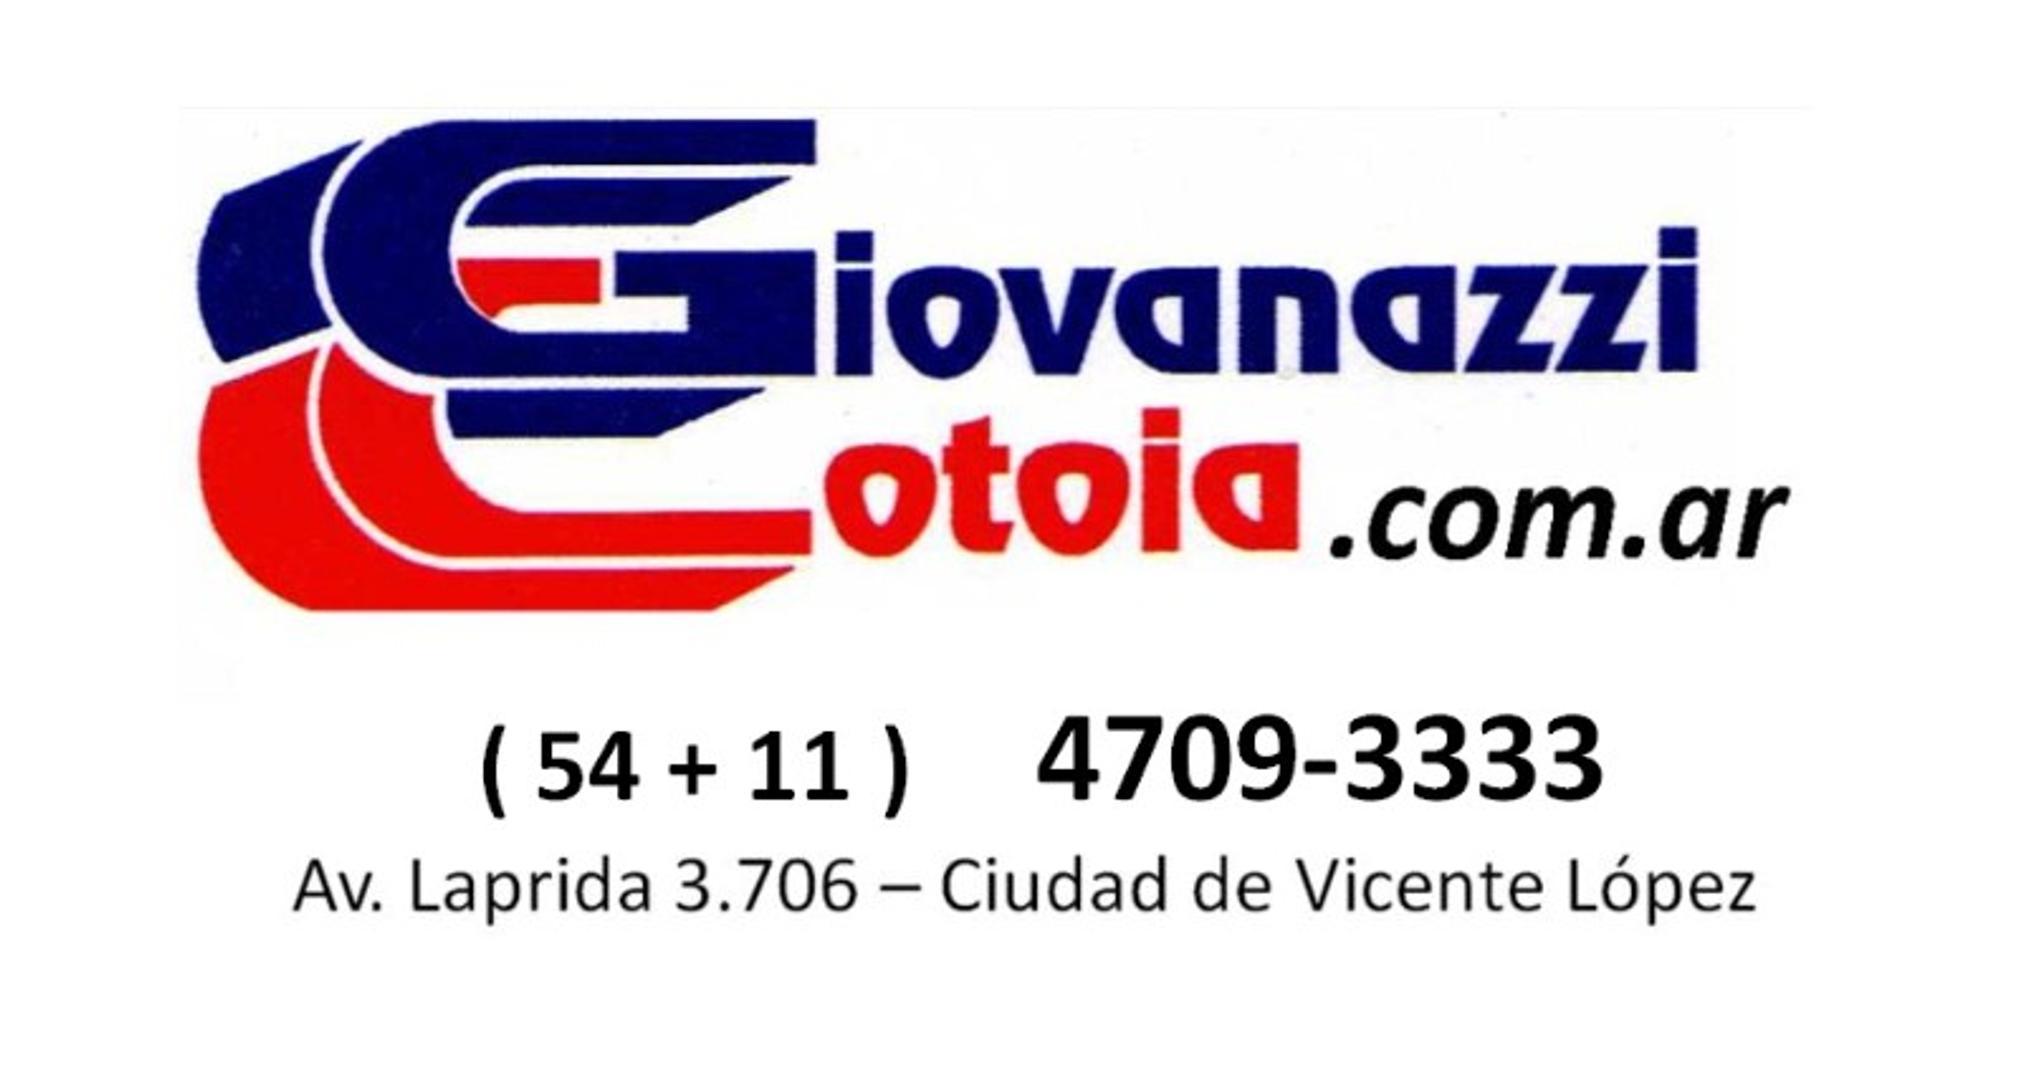 3 PISOS DE OFICINAS + LOCAL 300m2